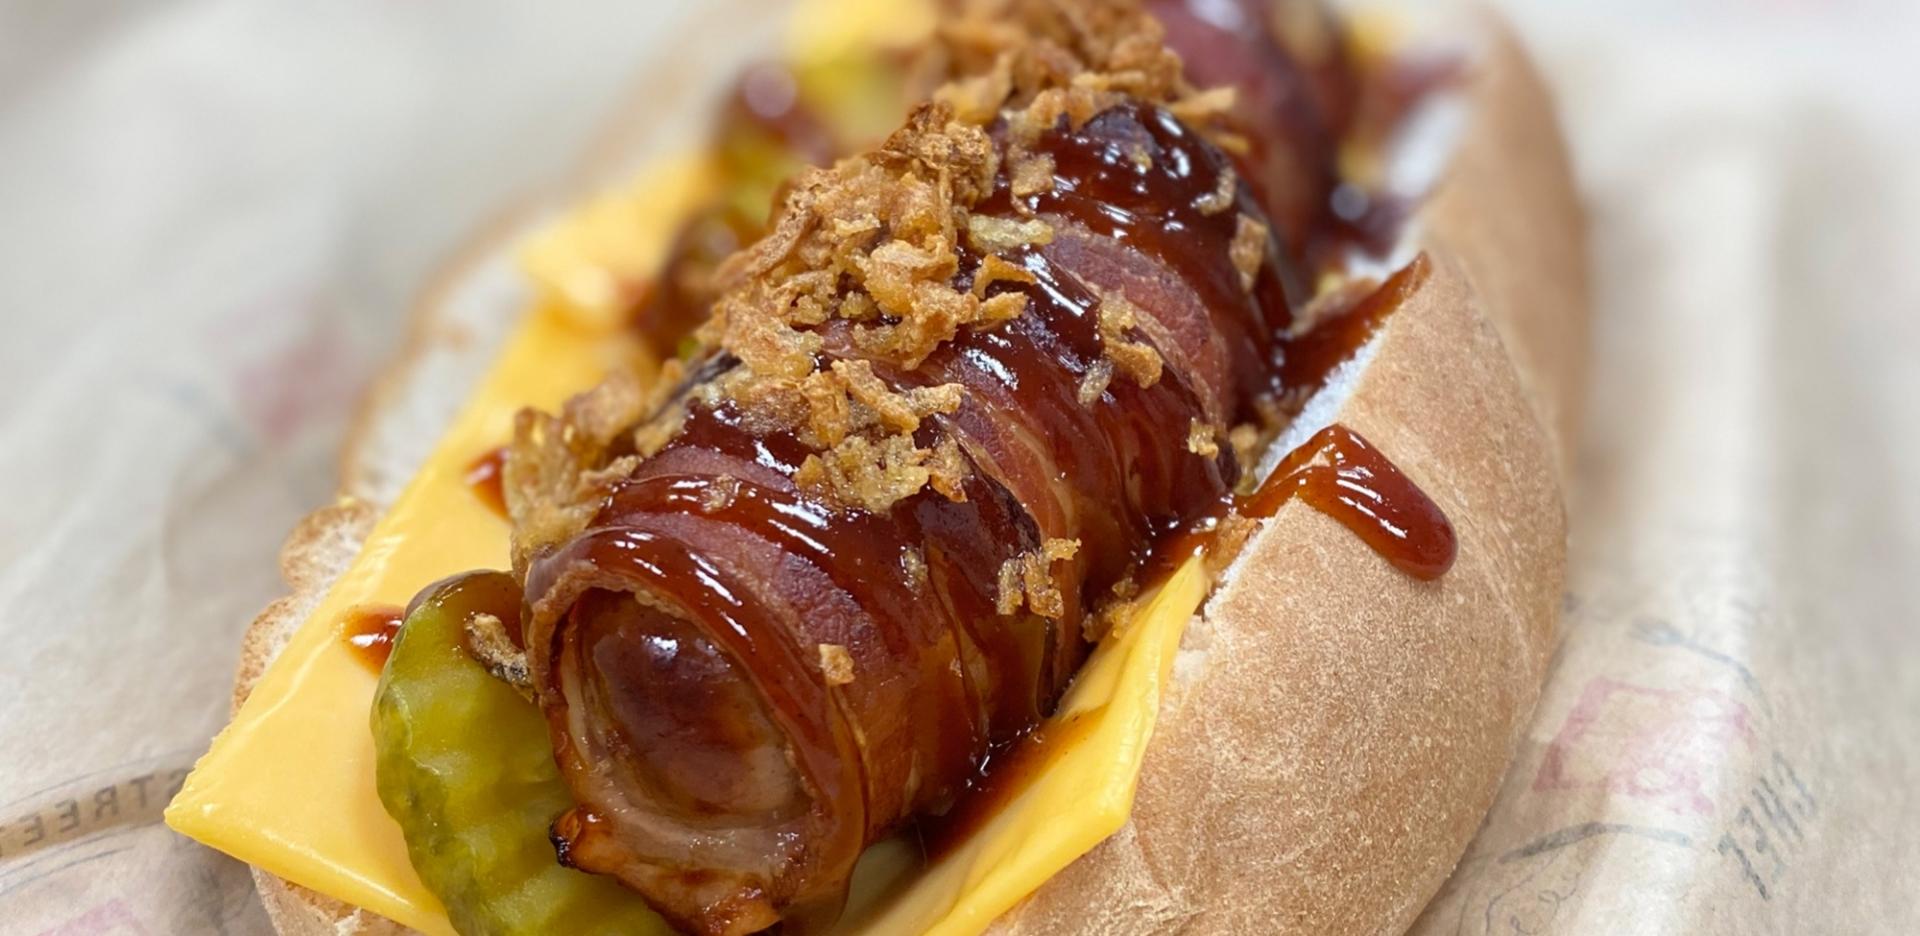 American Style Hot Dog